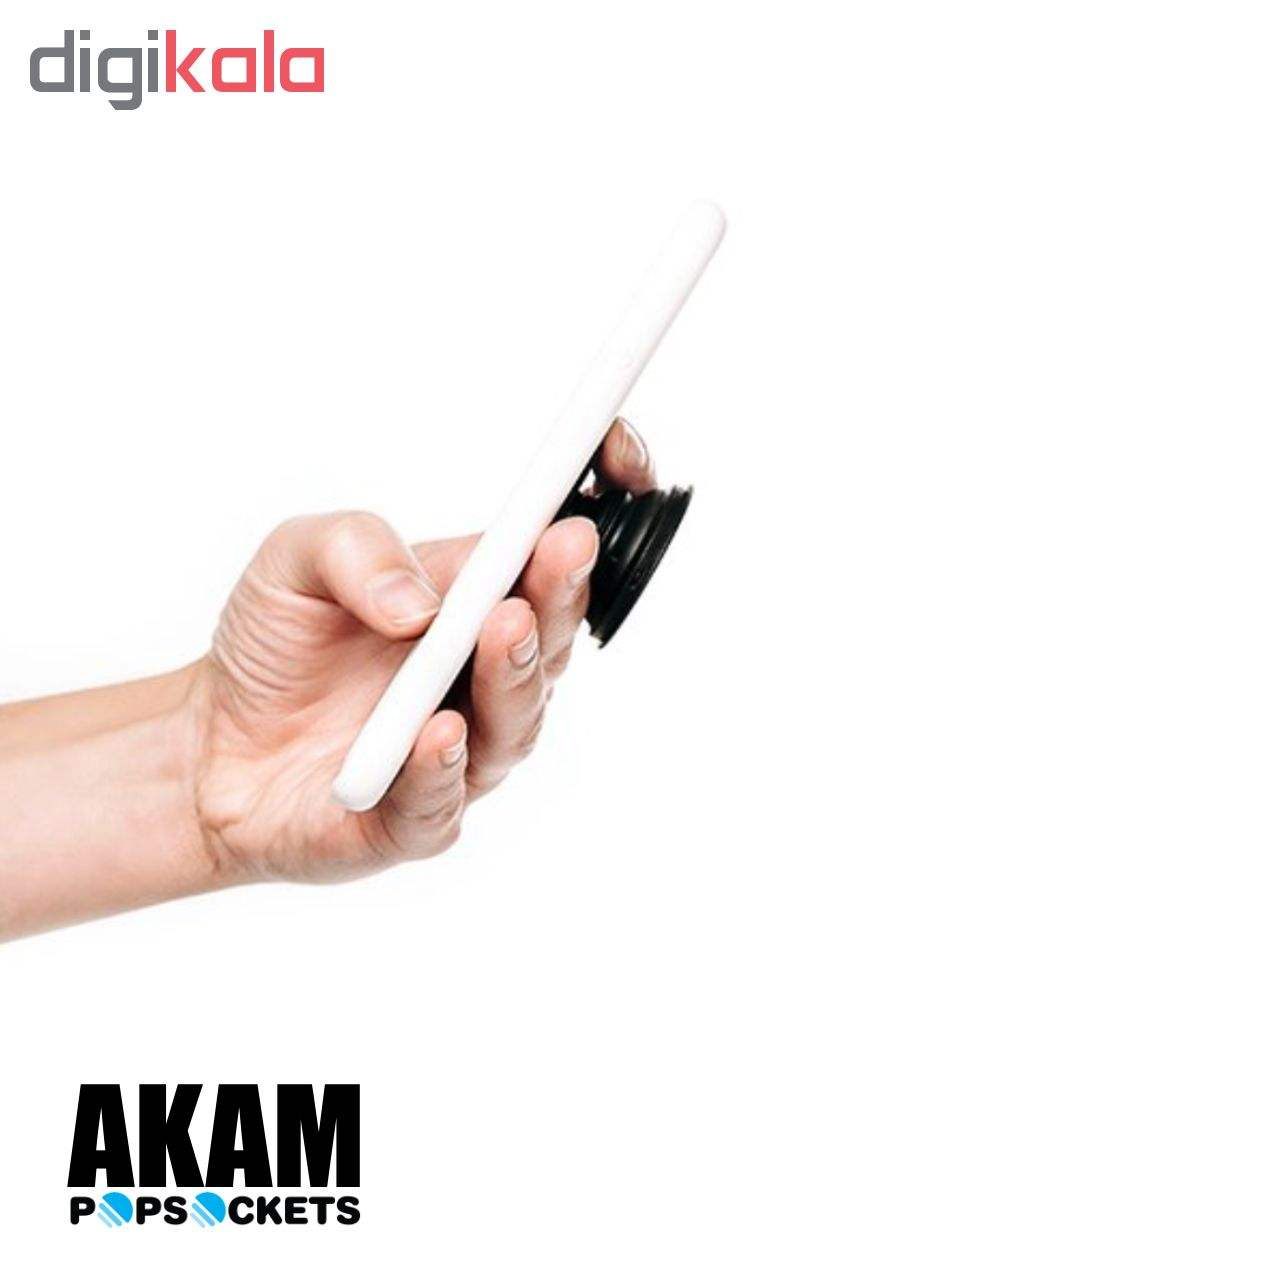 پایه نگهدارنده گوشی موبایل پاپ سوکت آکام مدل APS0078 main 1 9